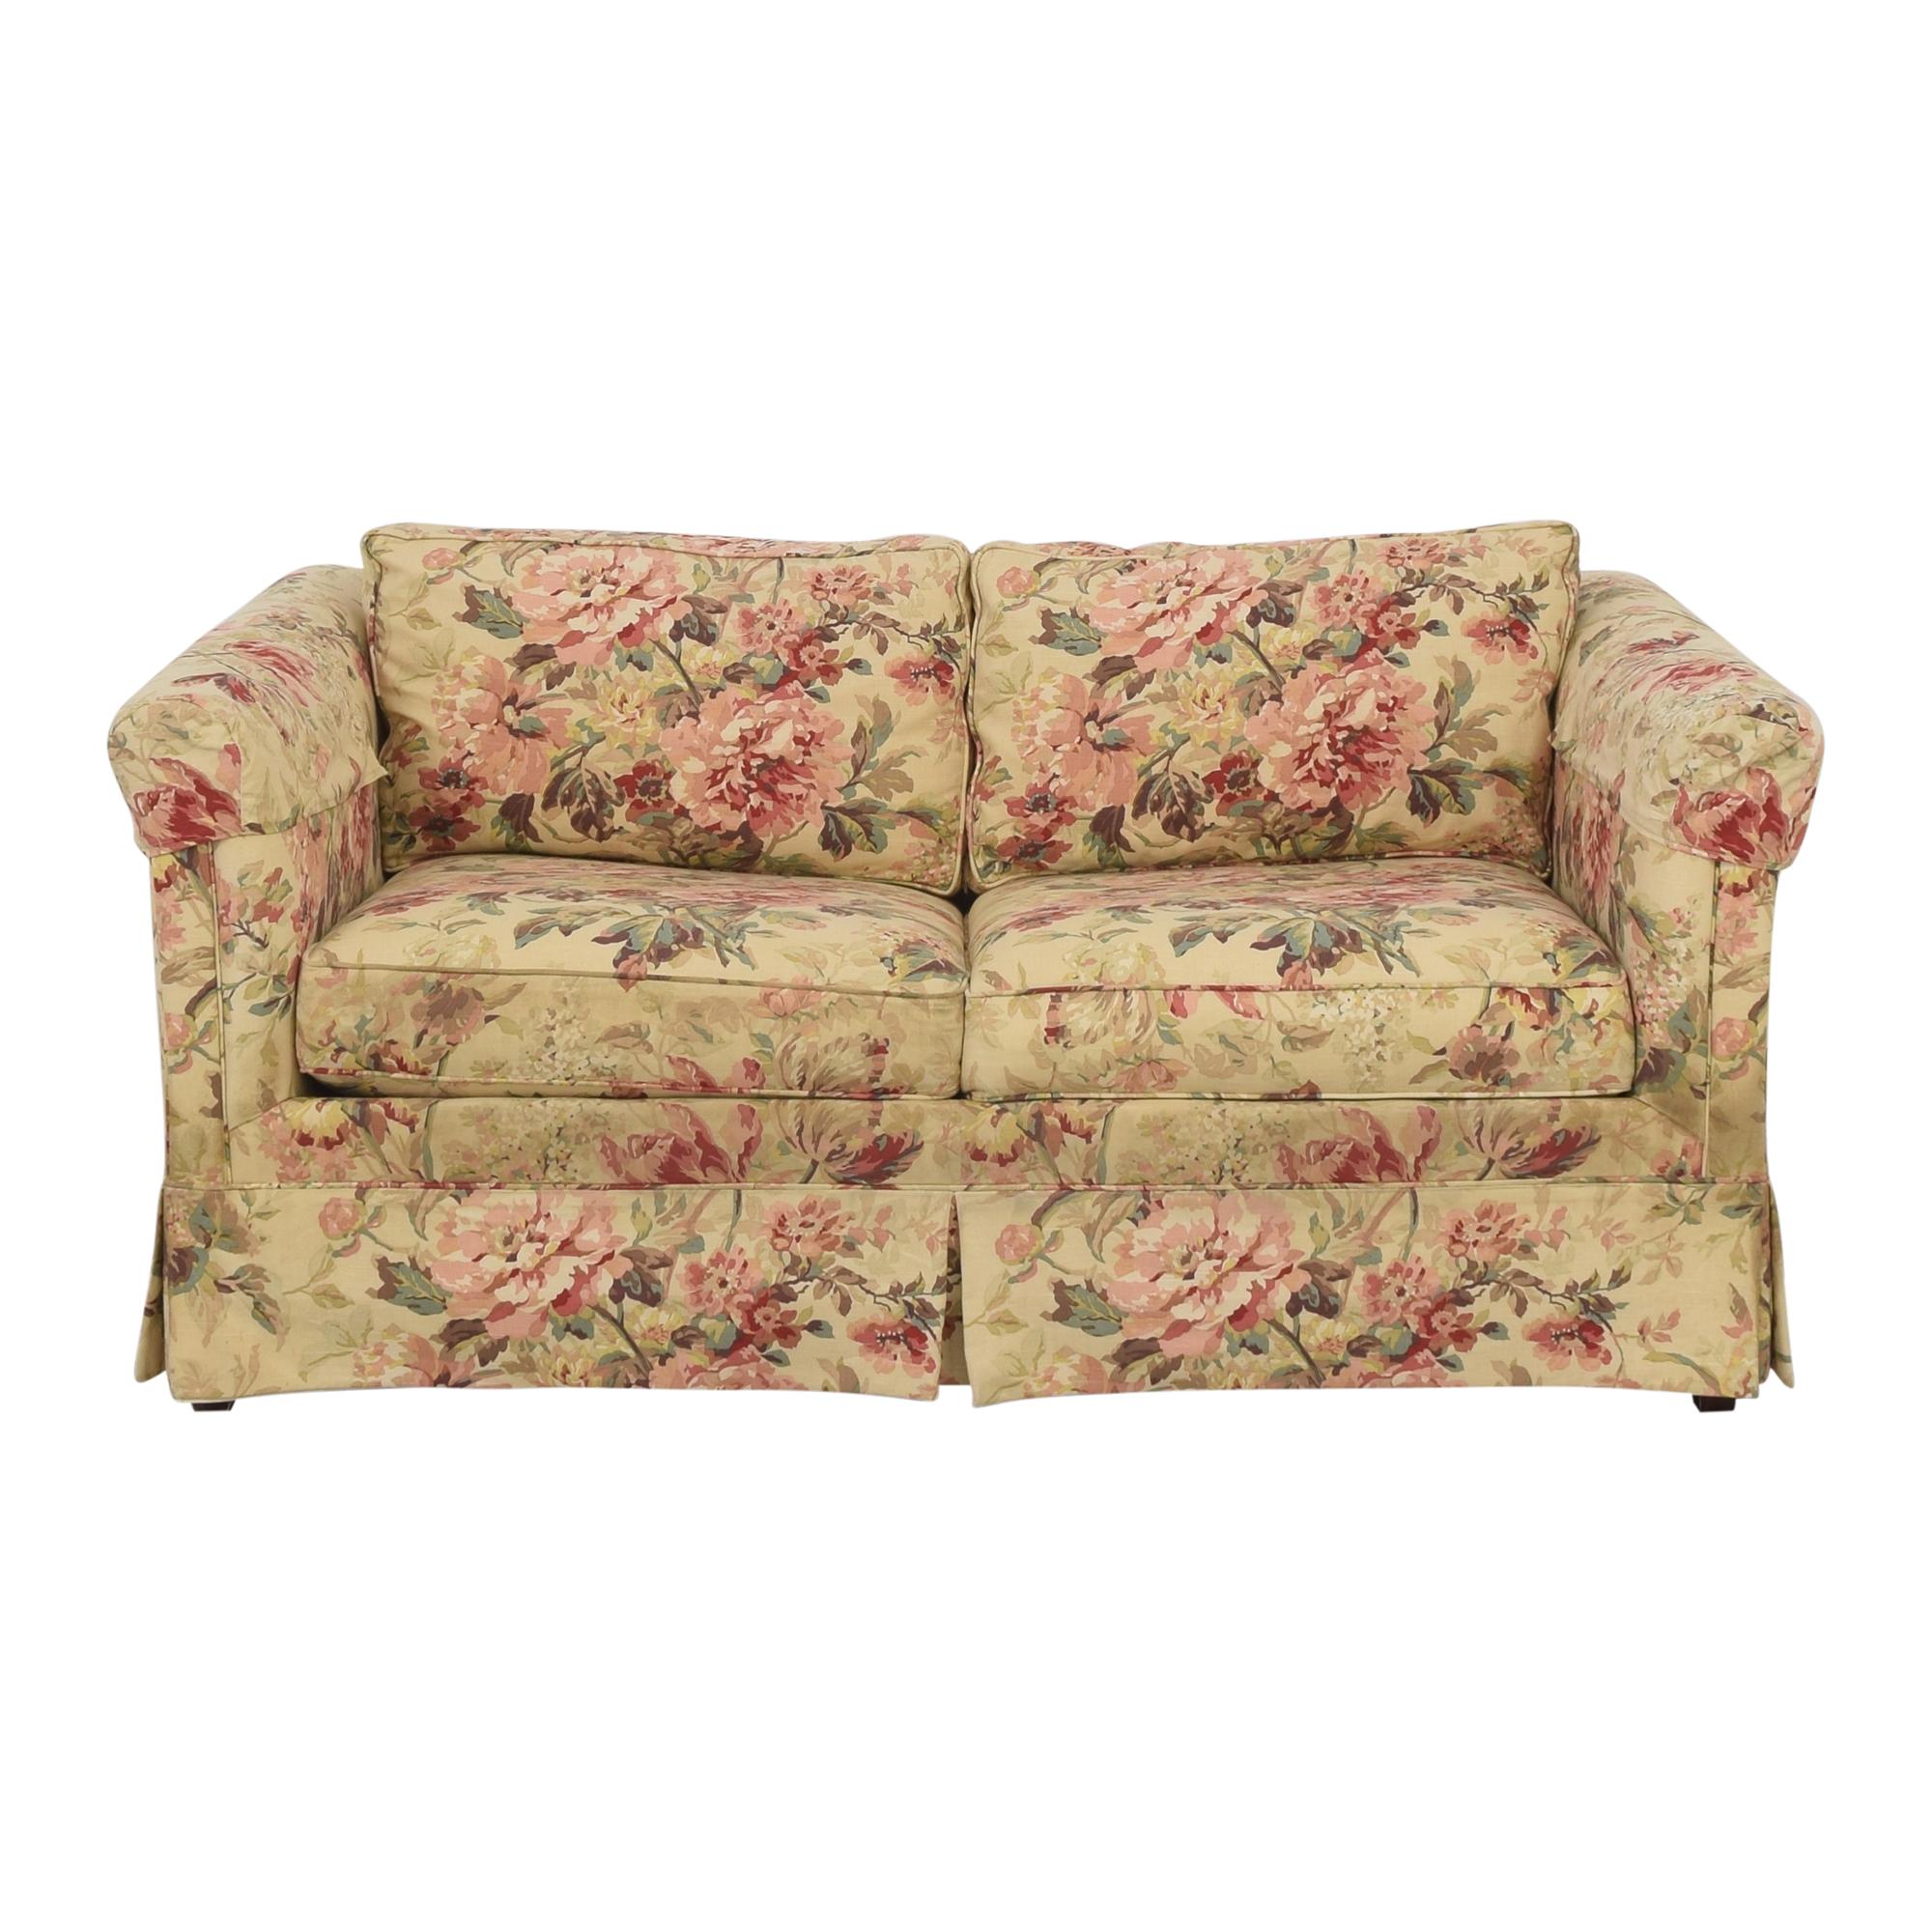 William Alan Loveseat Sleeper Sofa sale